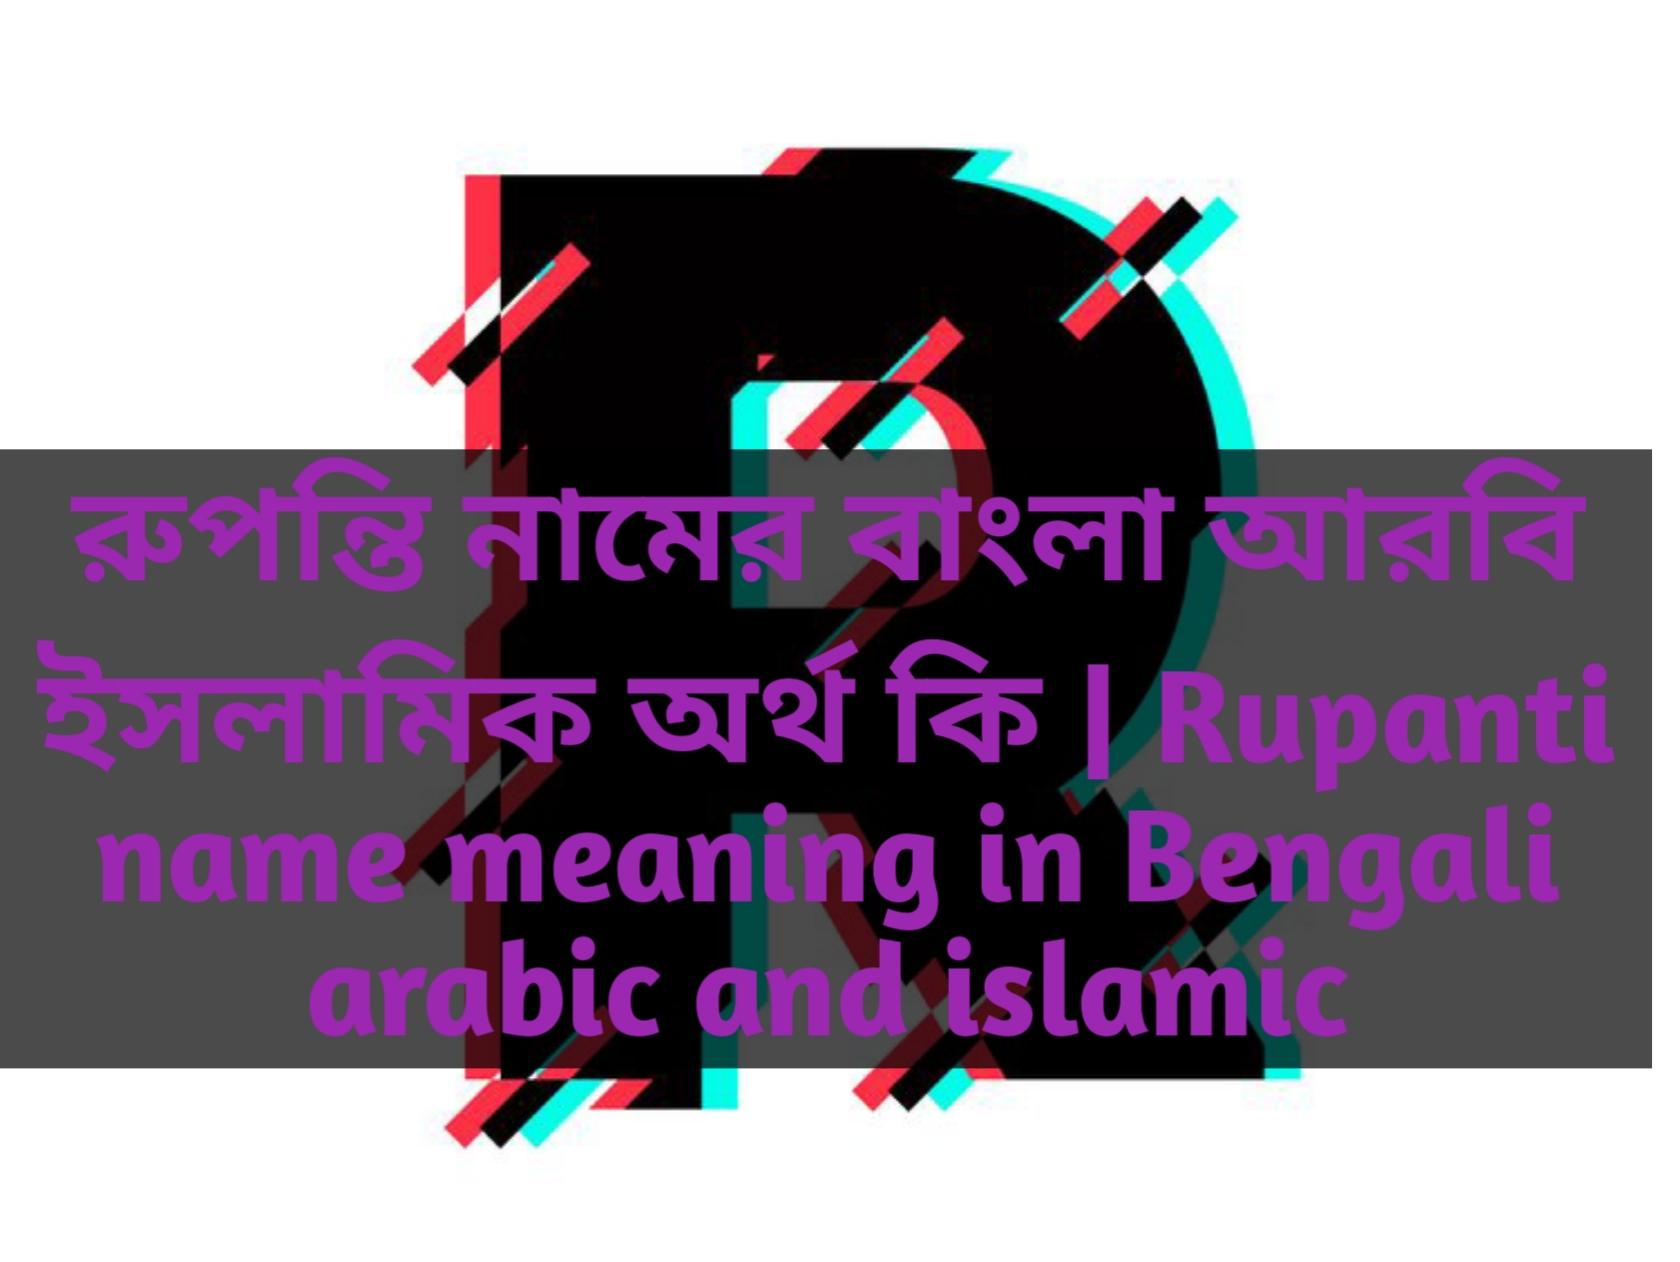 Rupanti name meaning in Bengali, রুপন্তি নামের অর্থ কি, রুপন্তি নামের বাংলা অর্থ কি, রুপন্তি নামের ইসলামিক অর্থ কি,